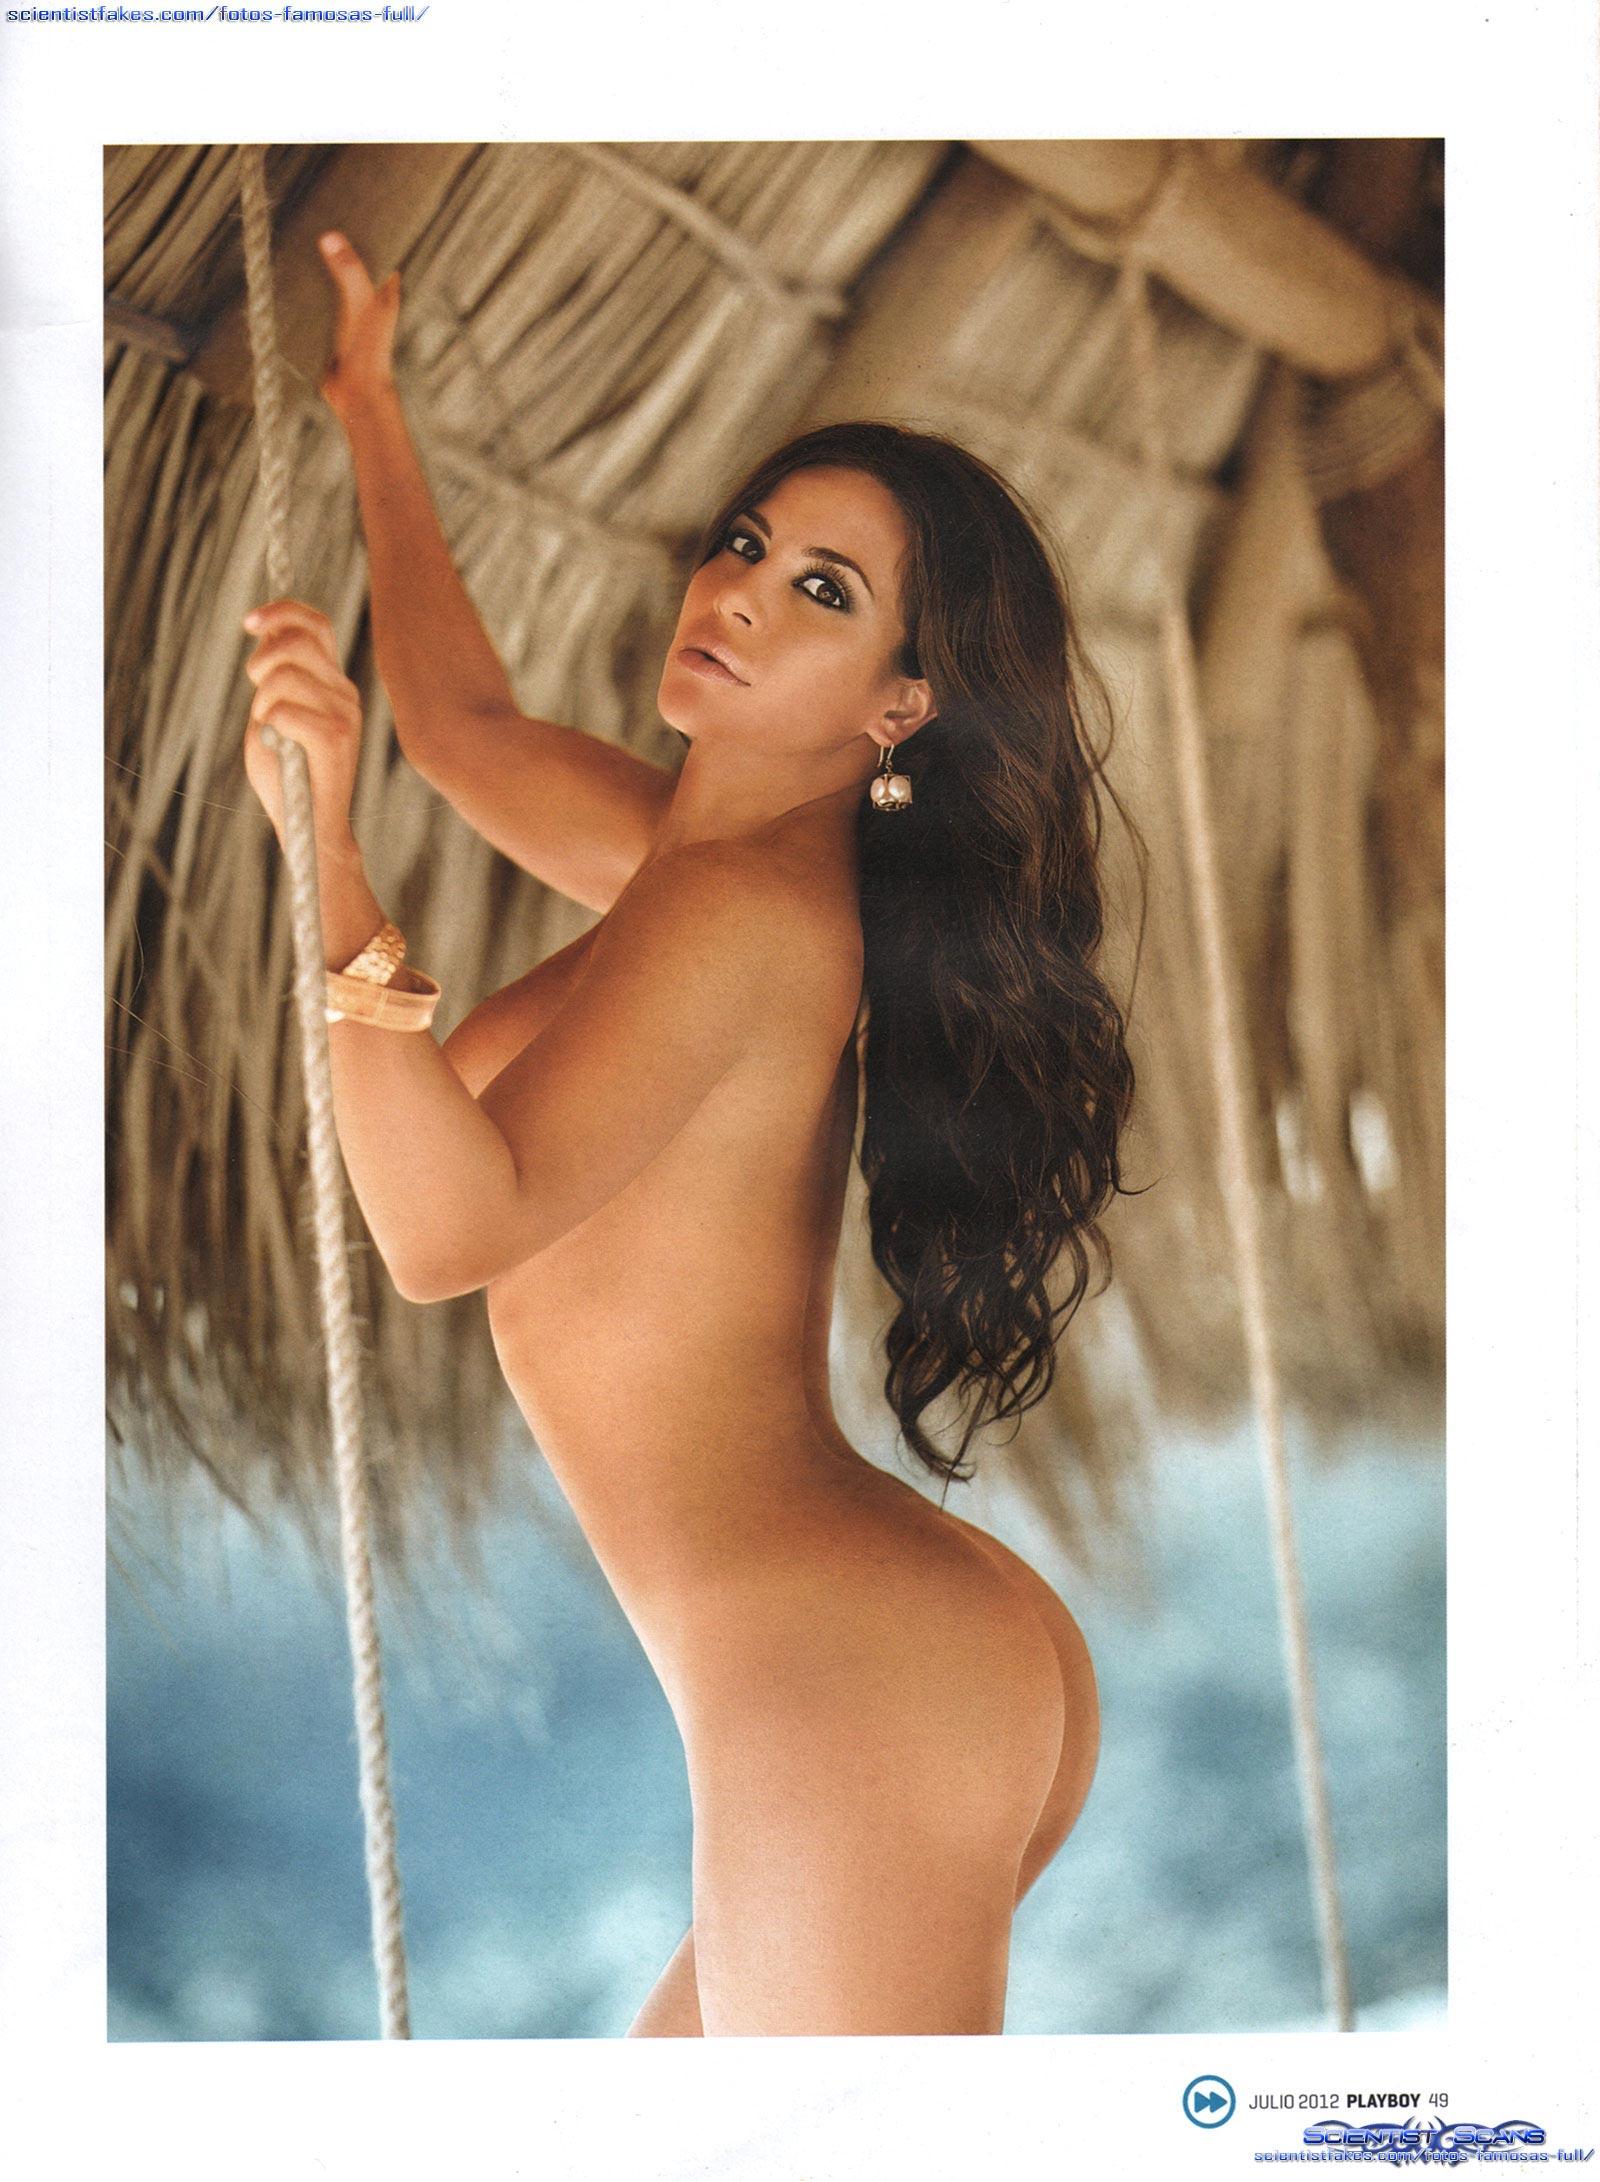 Pussy sexy hot naked girls vagina